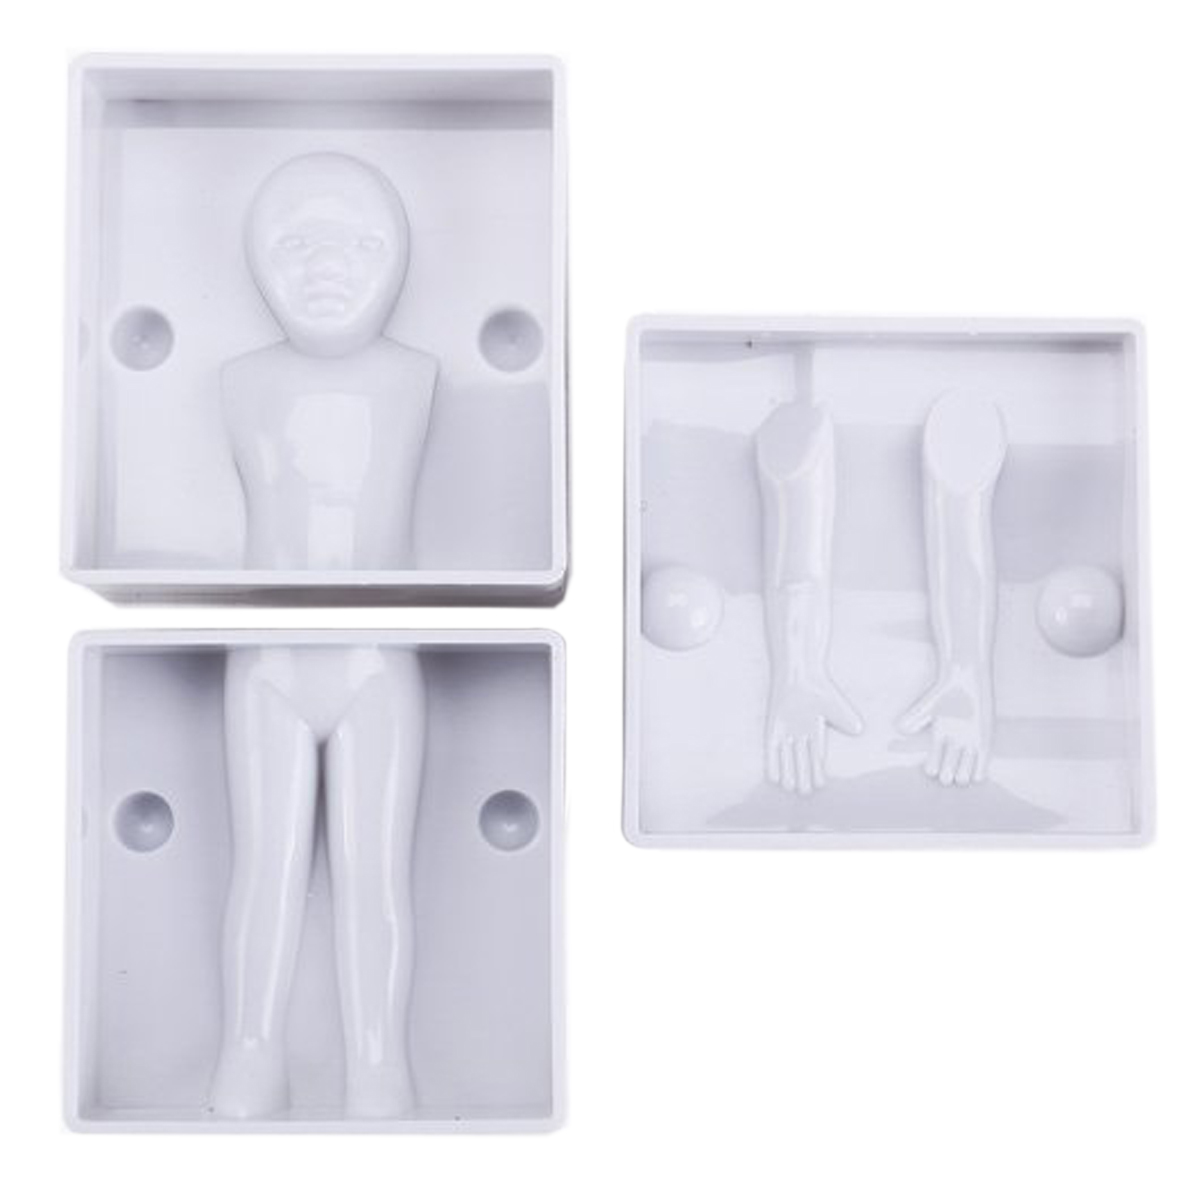 SDFC 4x moule 3D garcon fille Emporte-piece Pate a sucre Gateau Figurine